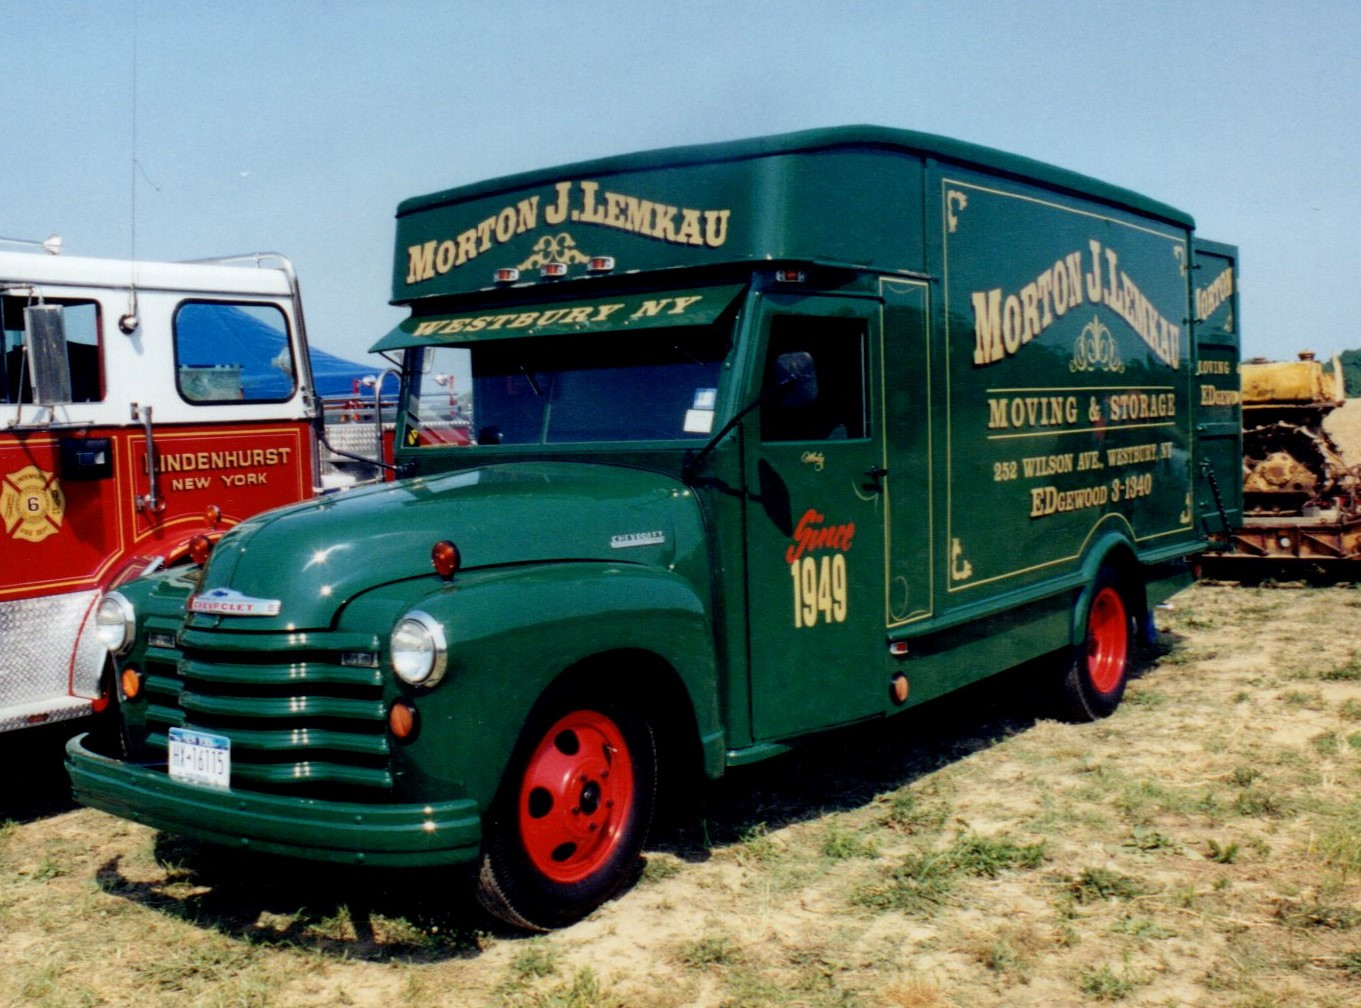 1949 Chevrolet moving van - Morton Lemkau